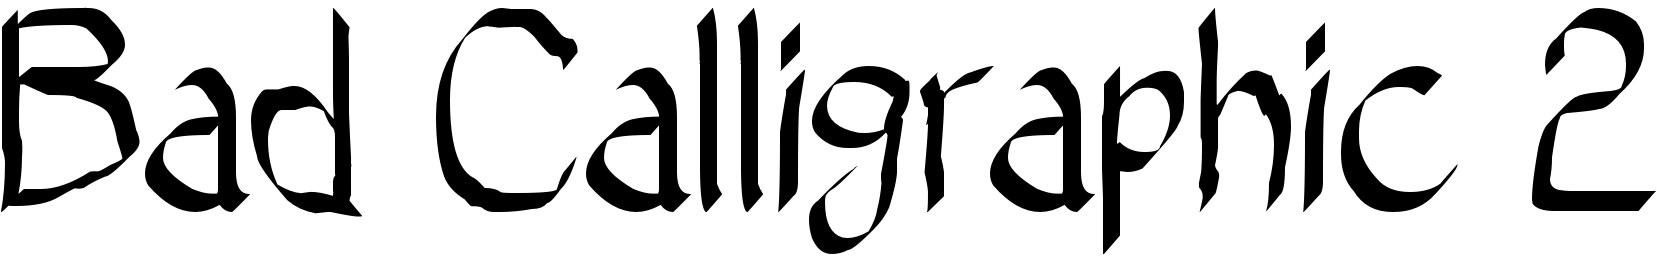 Bad Calligraphic 2